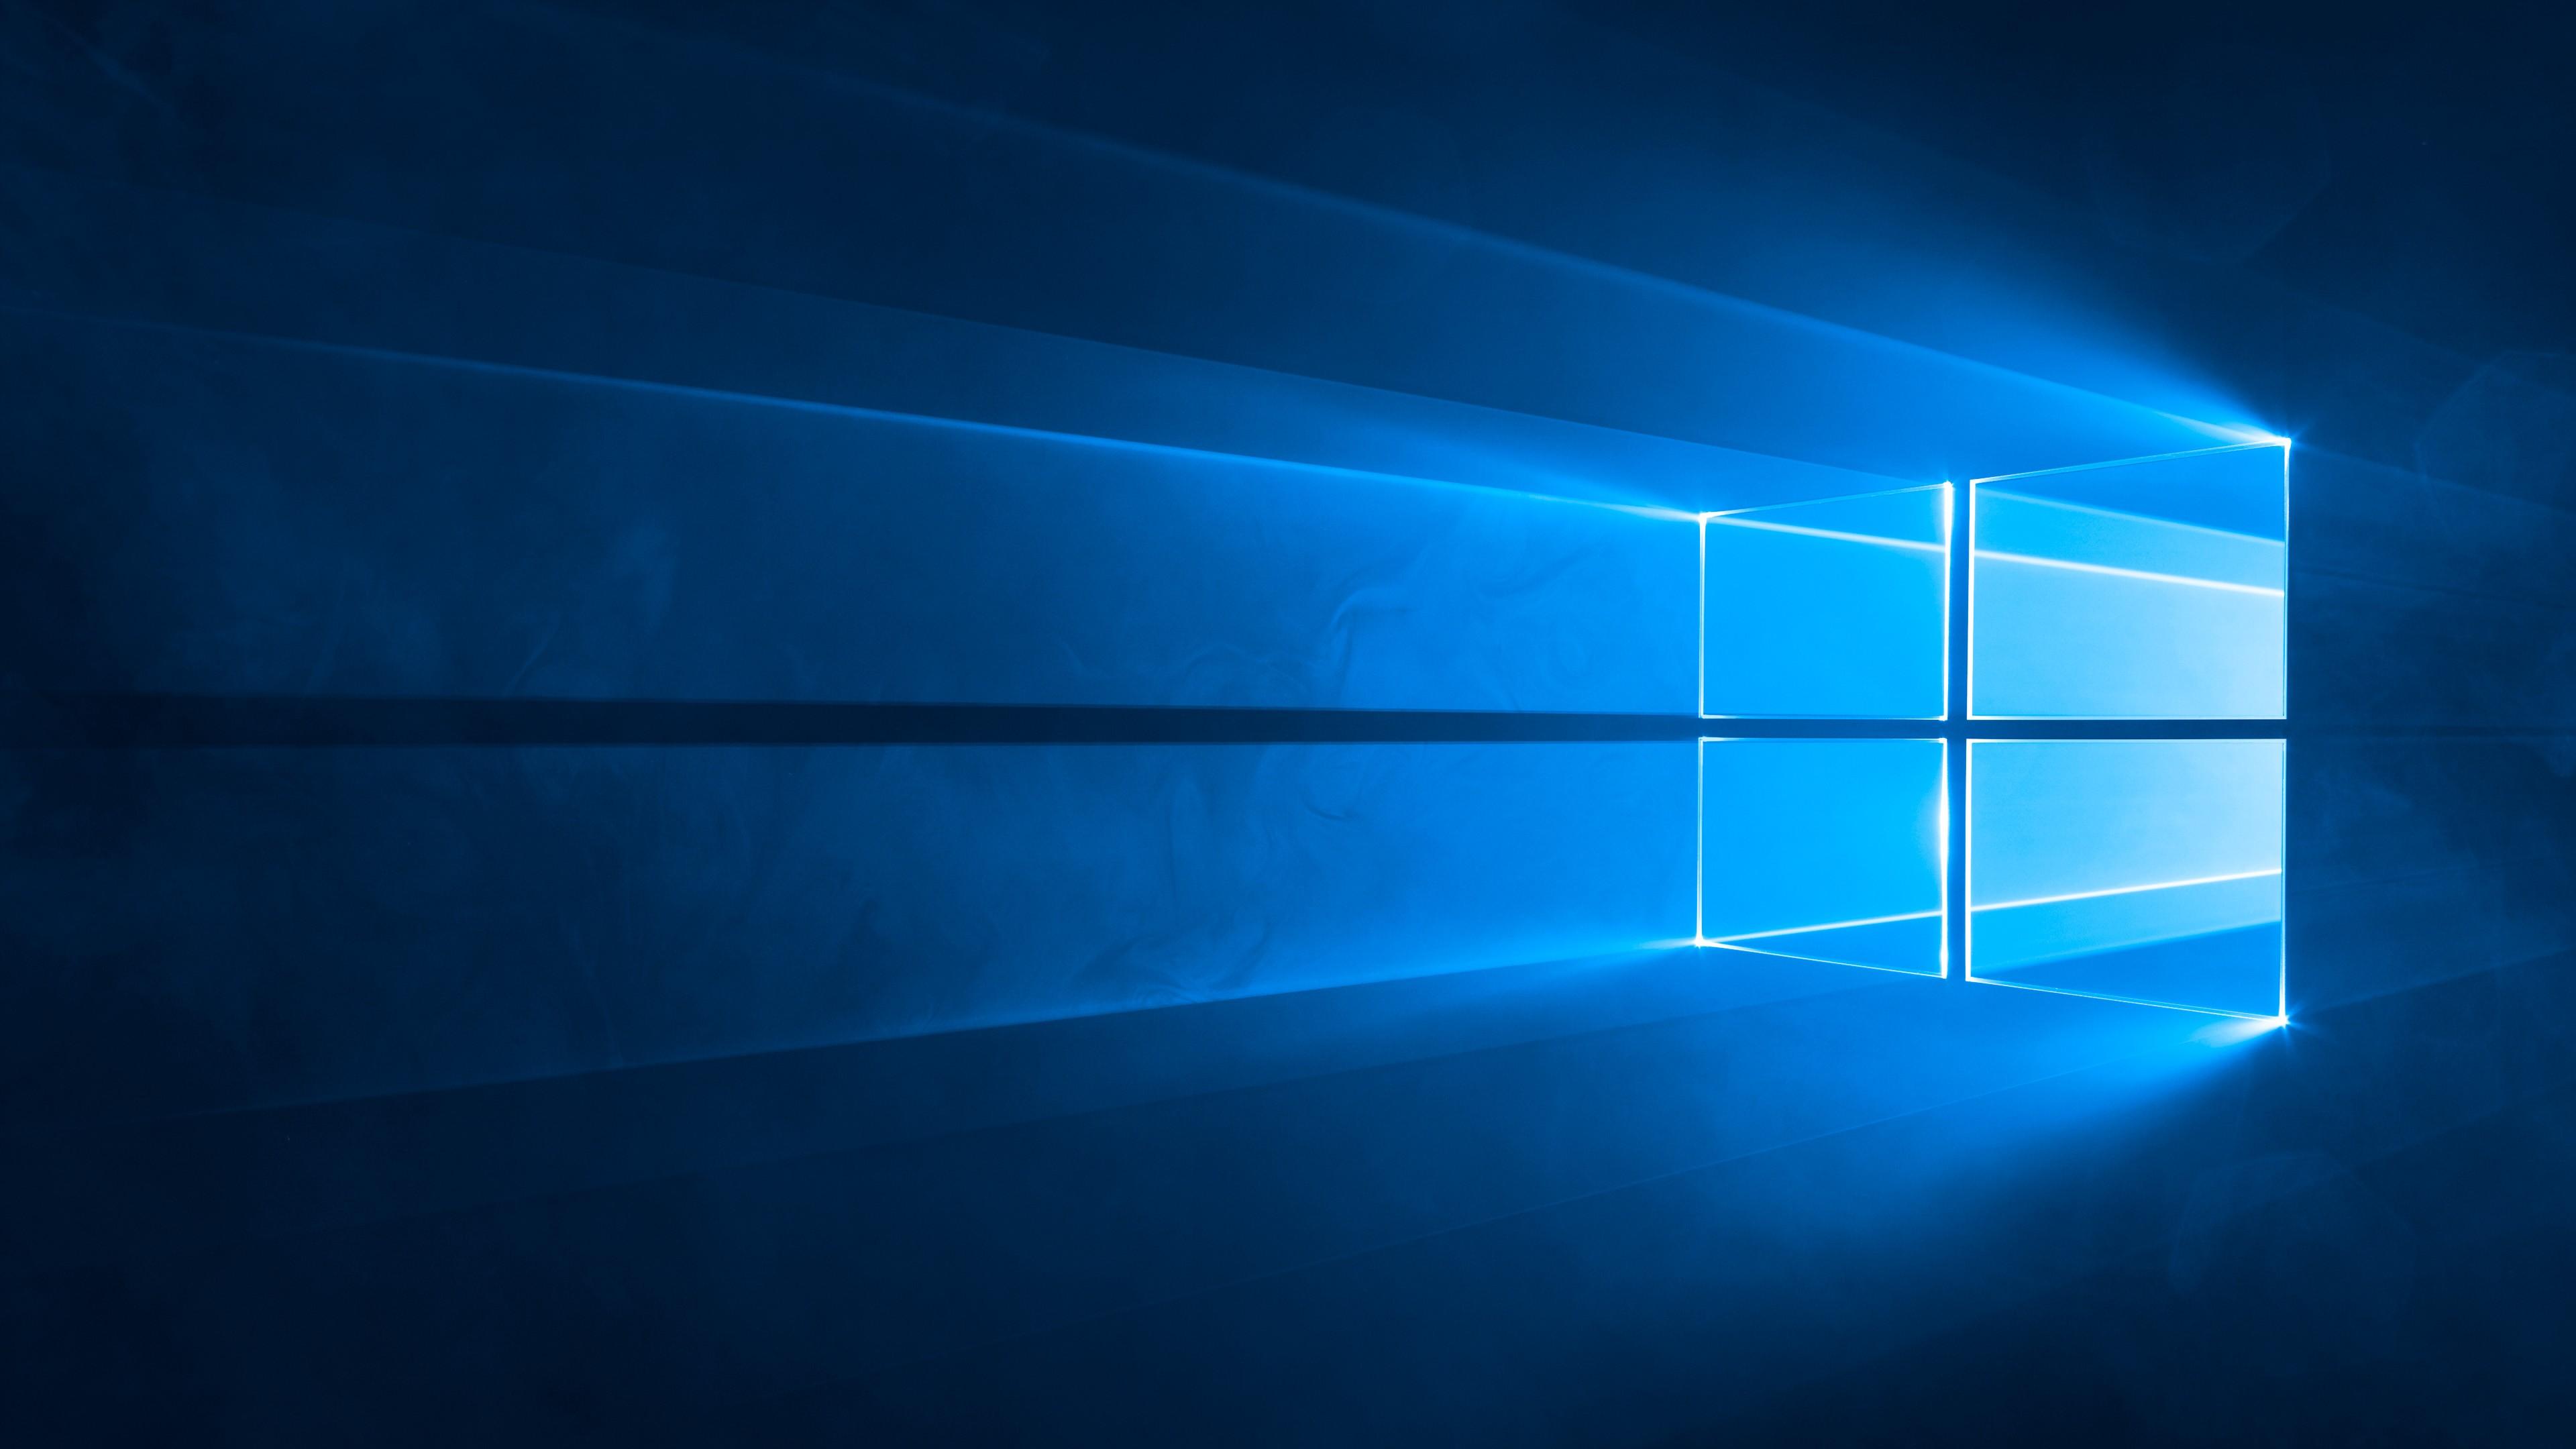 windows 10 wallpaper  os    recent  windows 10  microsoft  blue